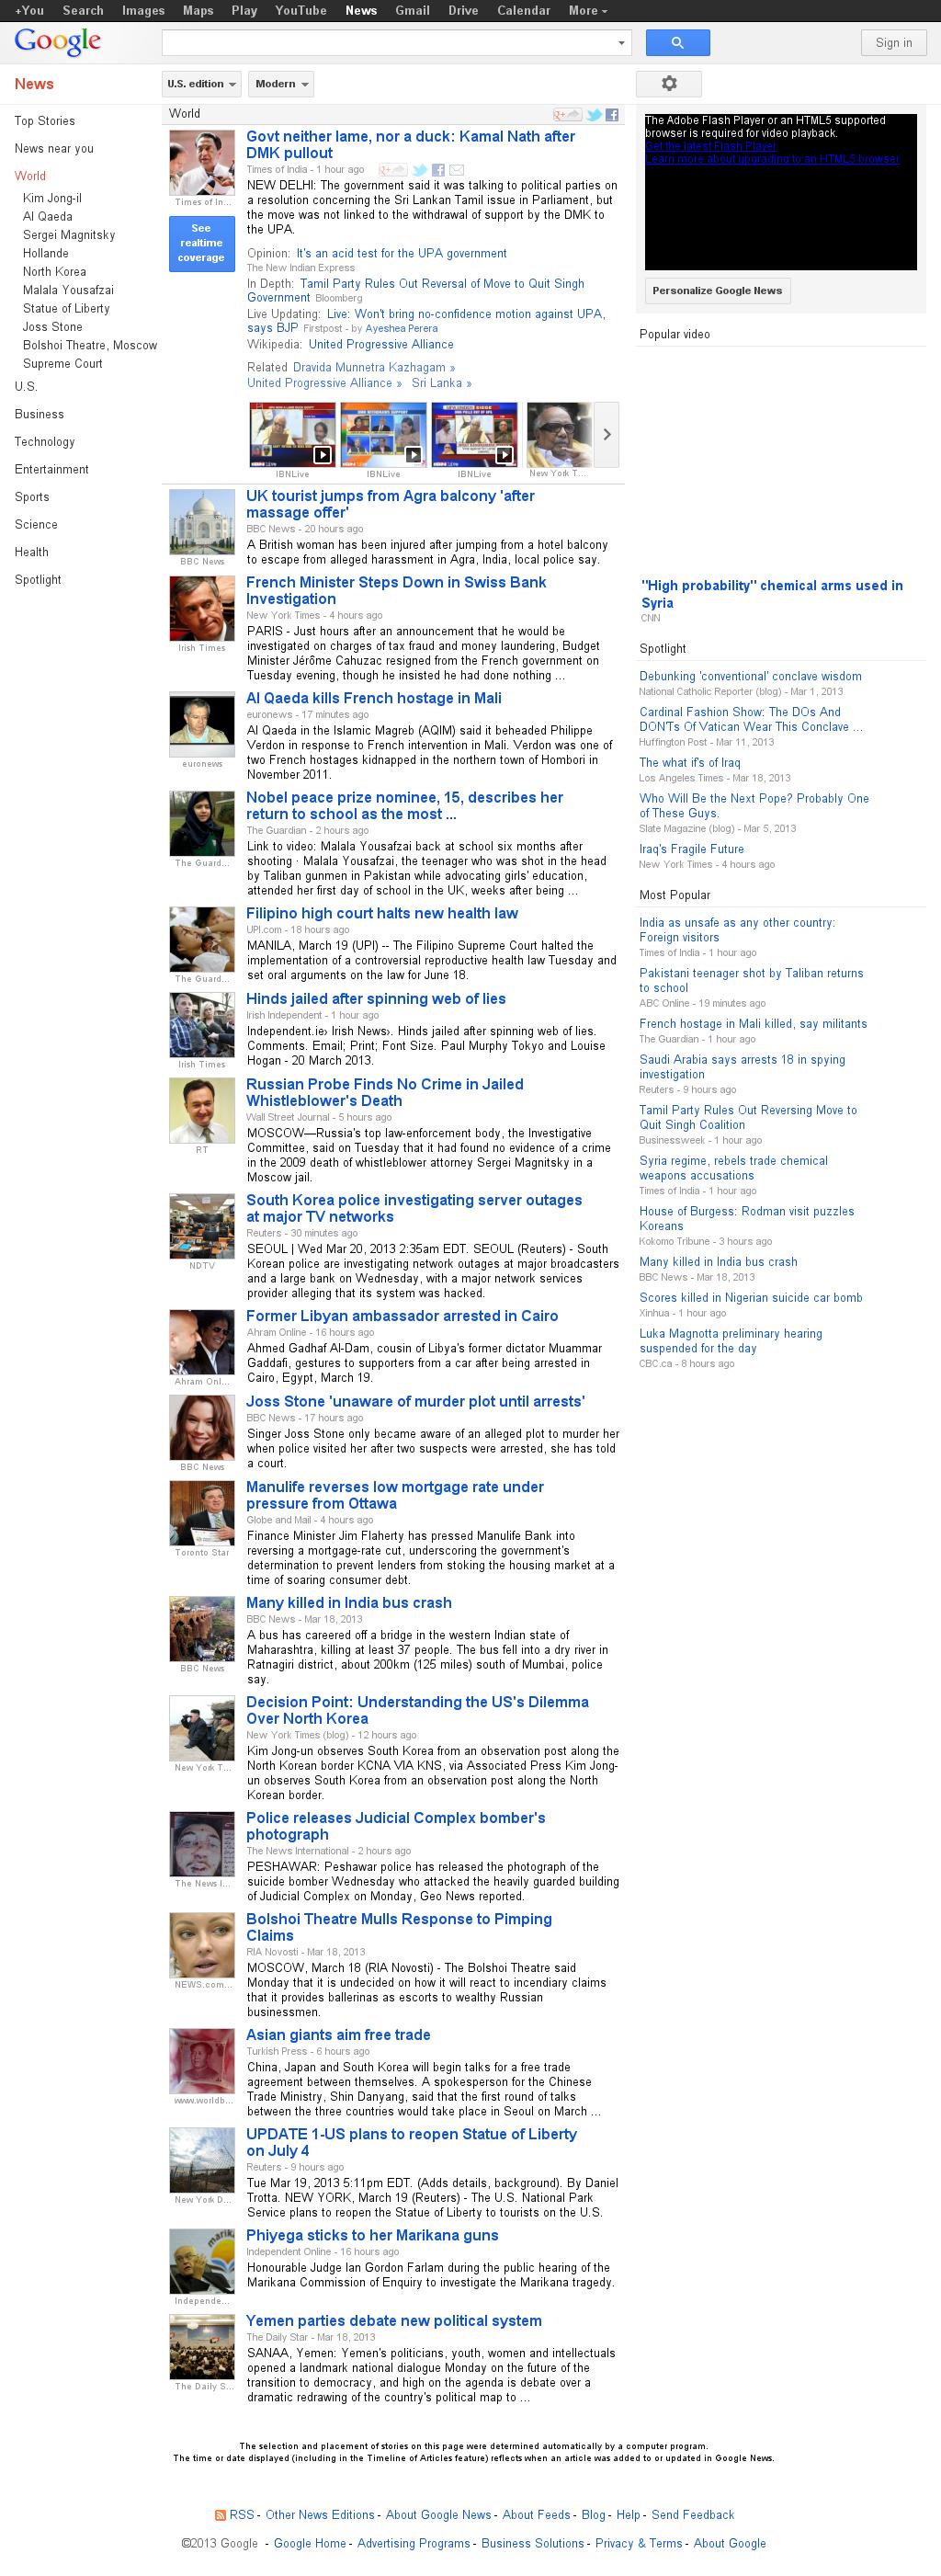 Google News: World at Wednesday March 20, 2013, 7:10 a.m. UTC